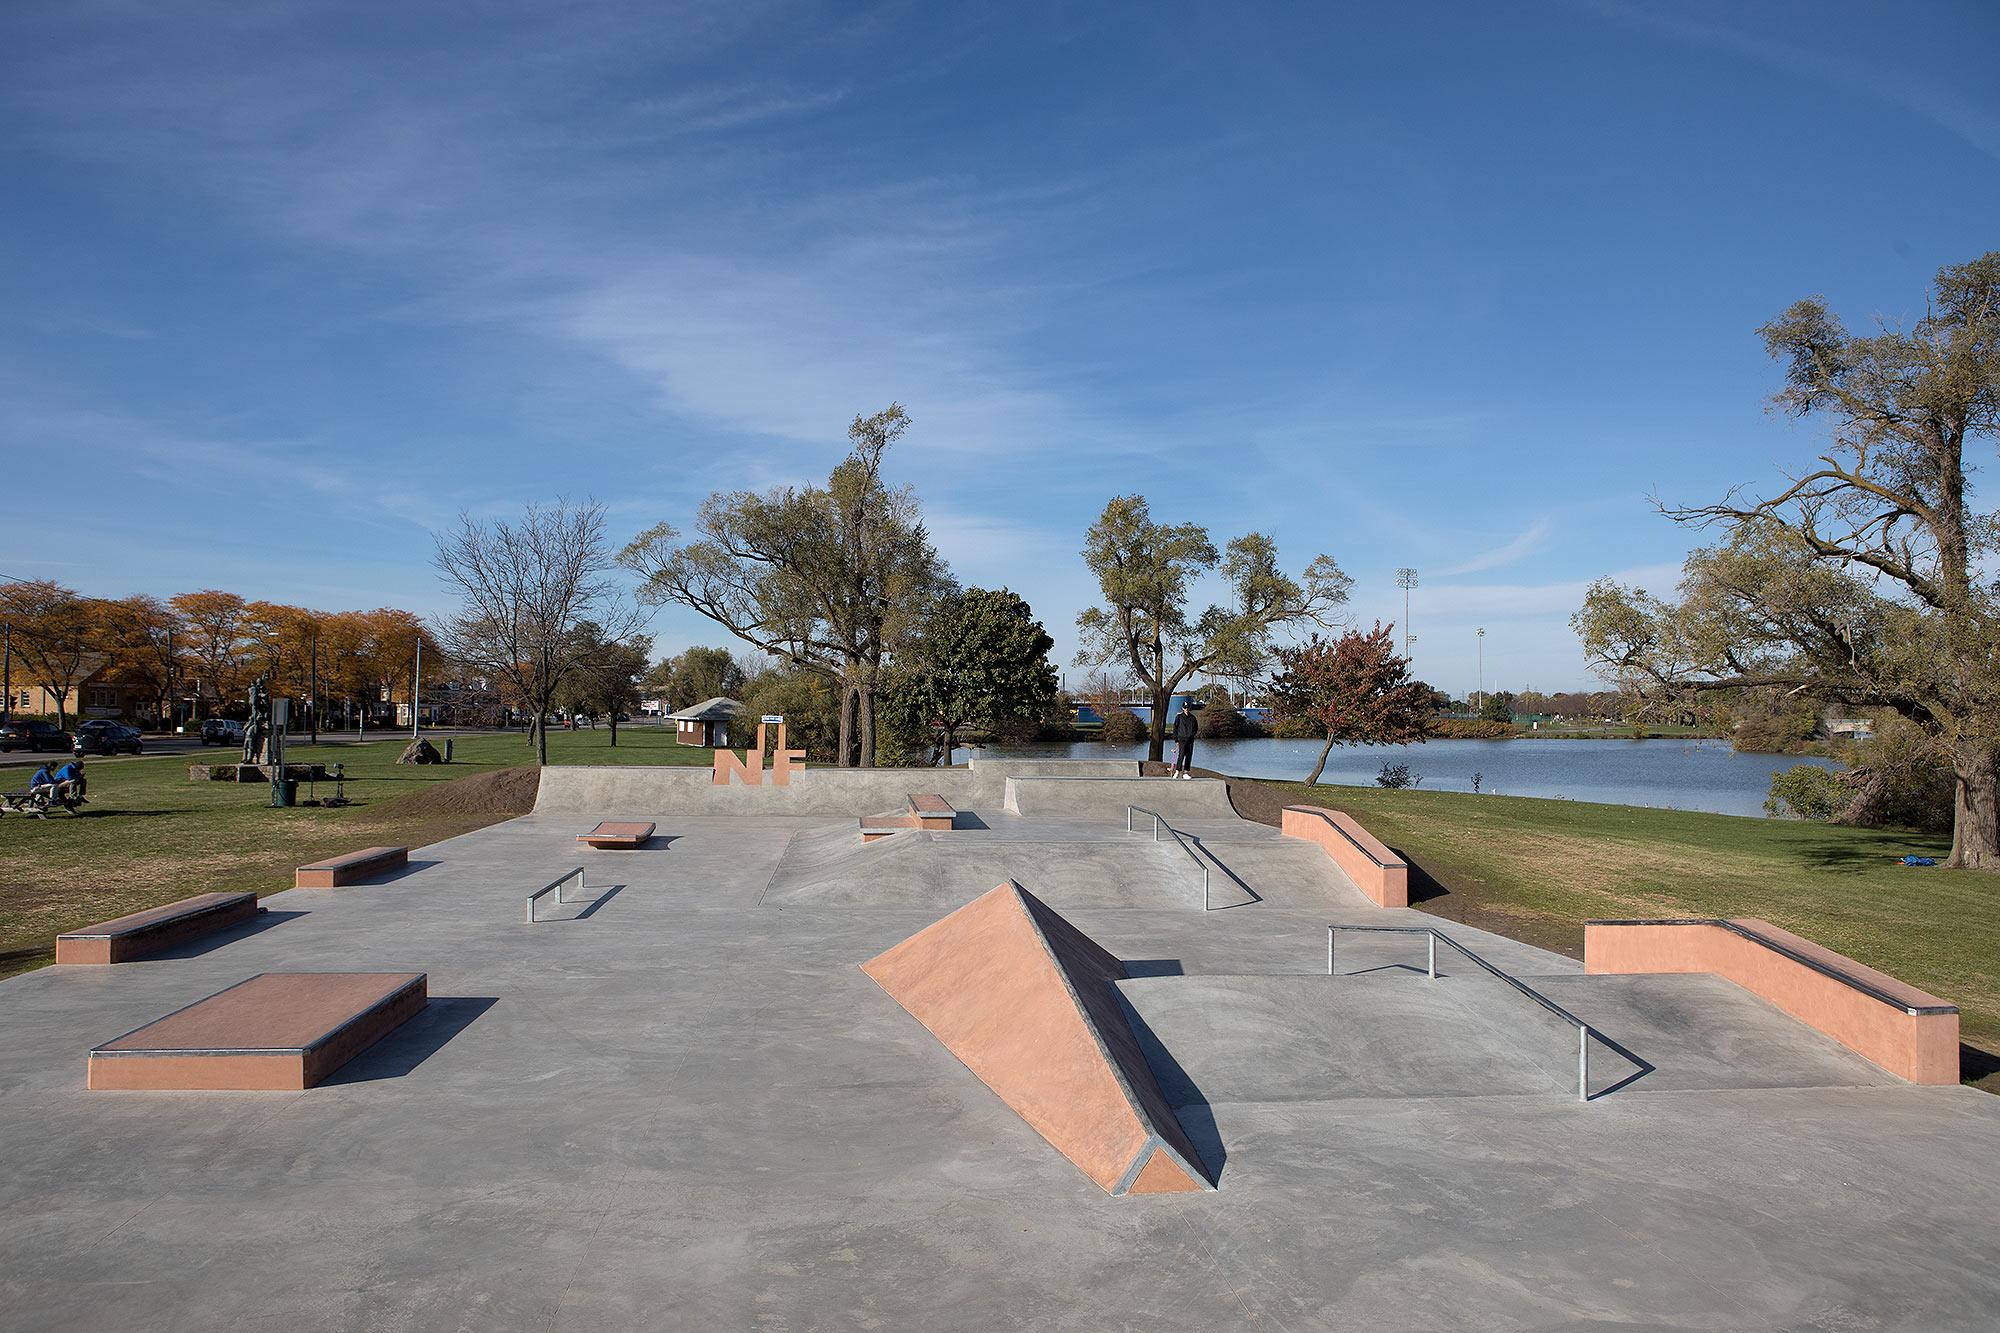 Niagara Falls Skate Park